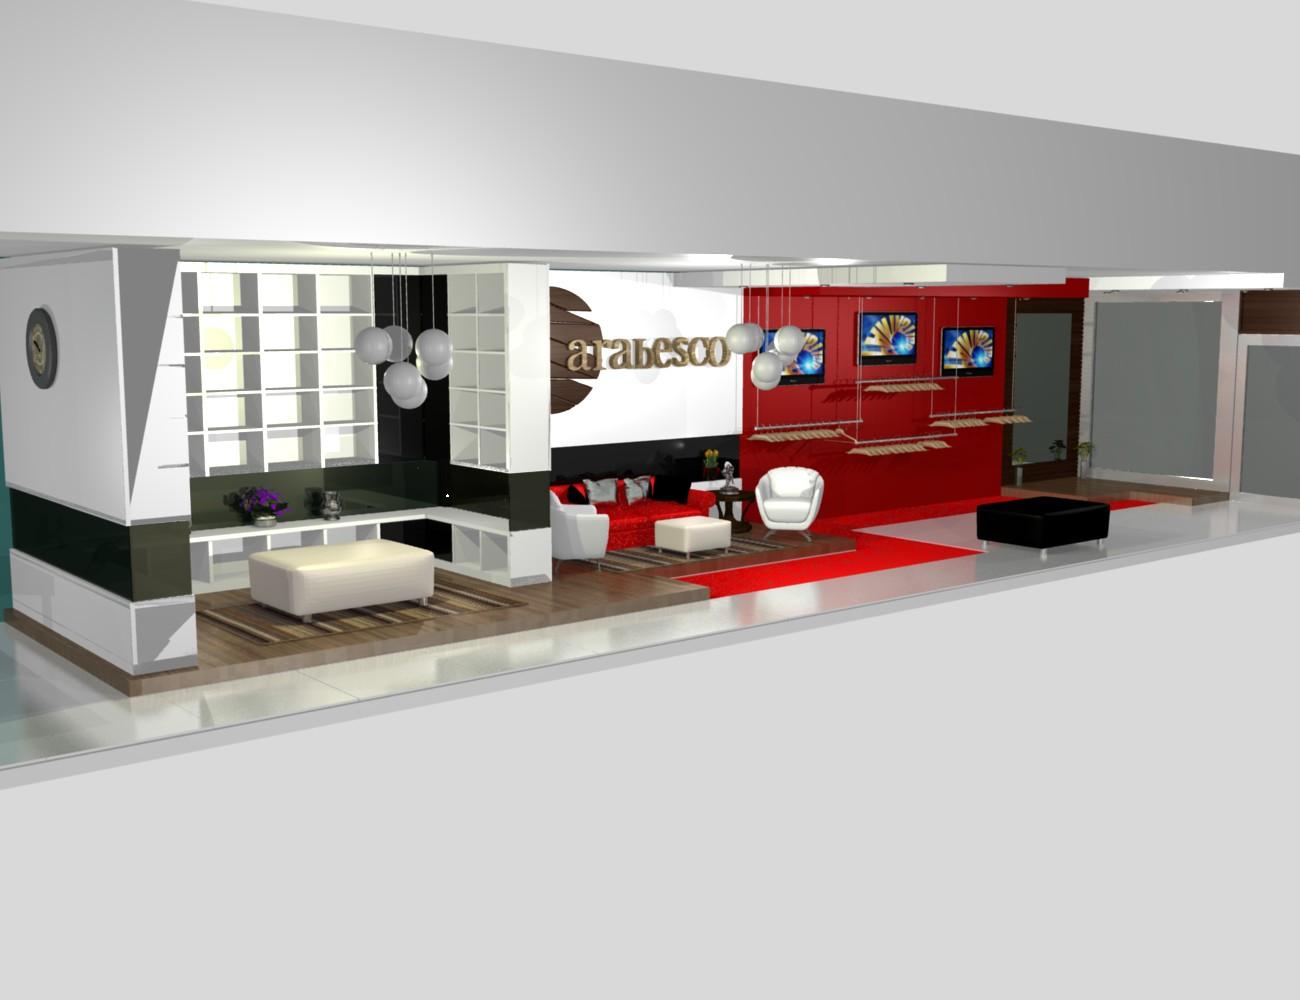 PROJETOS (11) 3976 8616: móveis loja projetos modernos Shopping #B91212 1300 1000